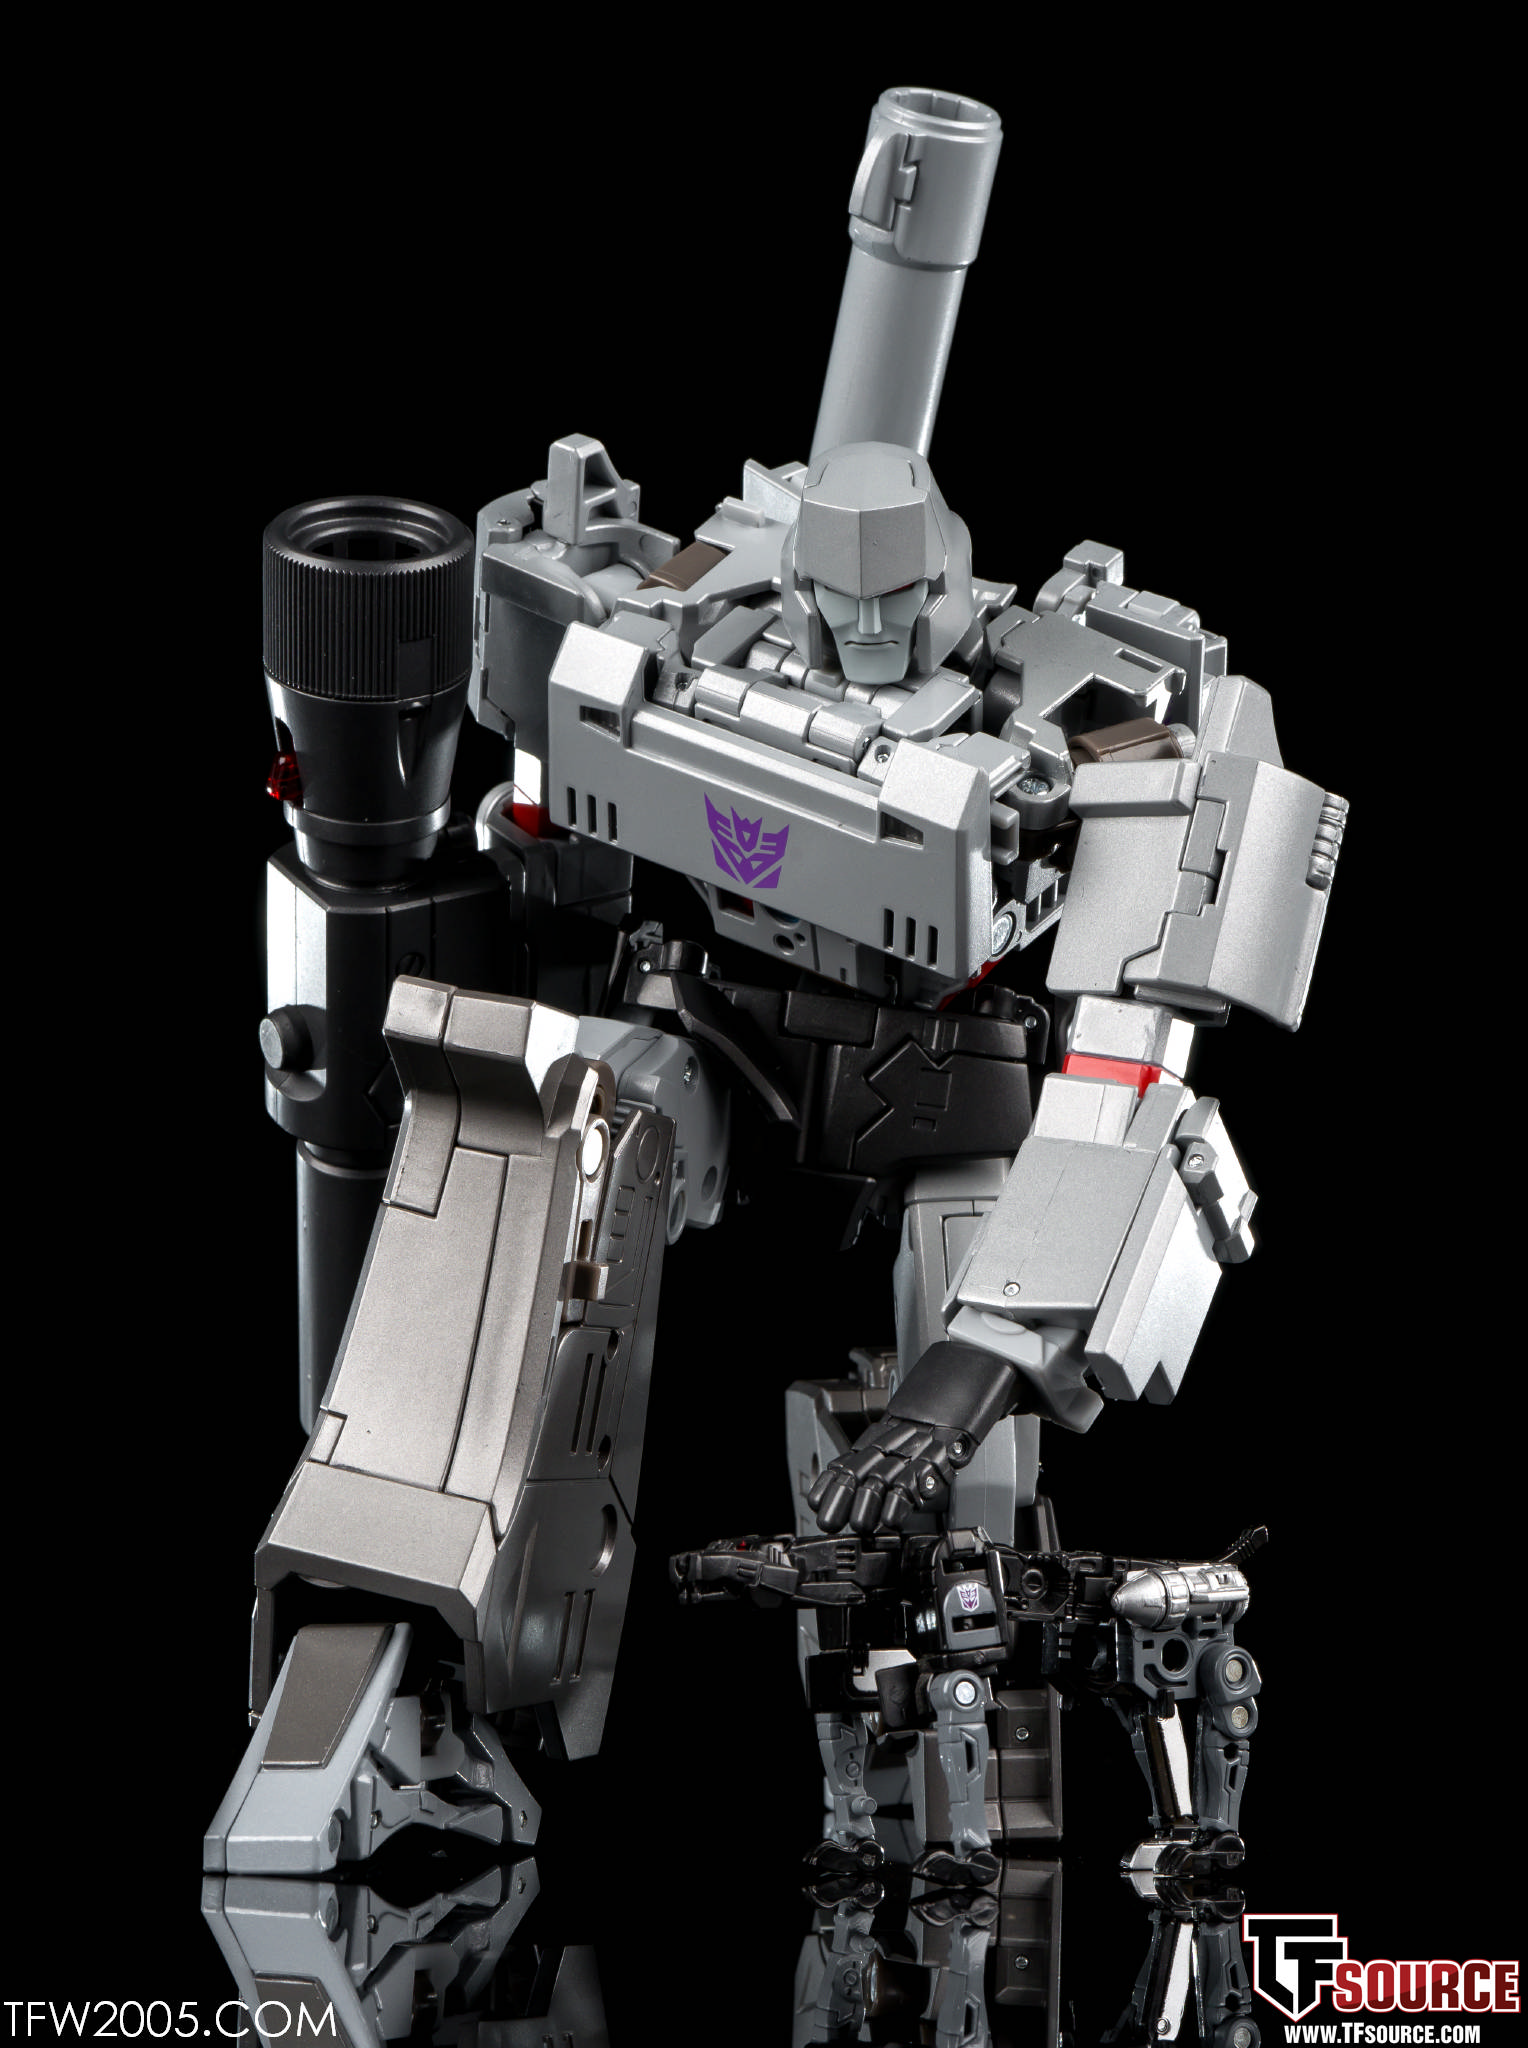 MP-36 Masterpiece Megatron In-Depth Gallery - Transformers